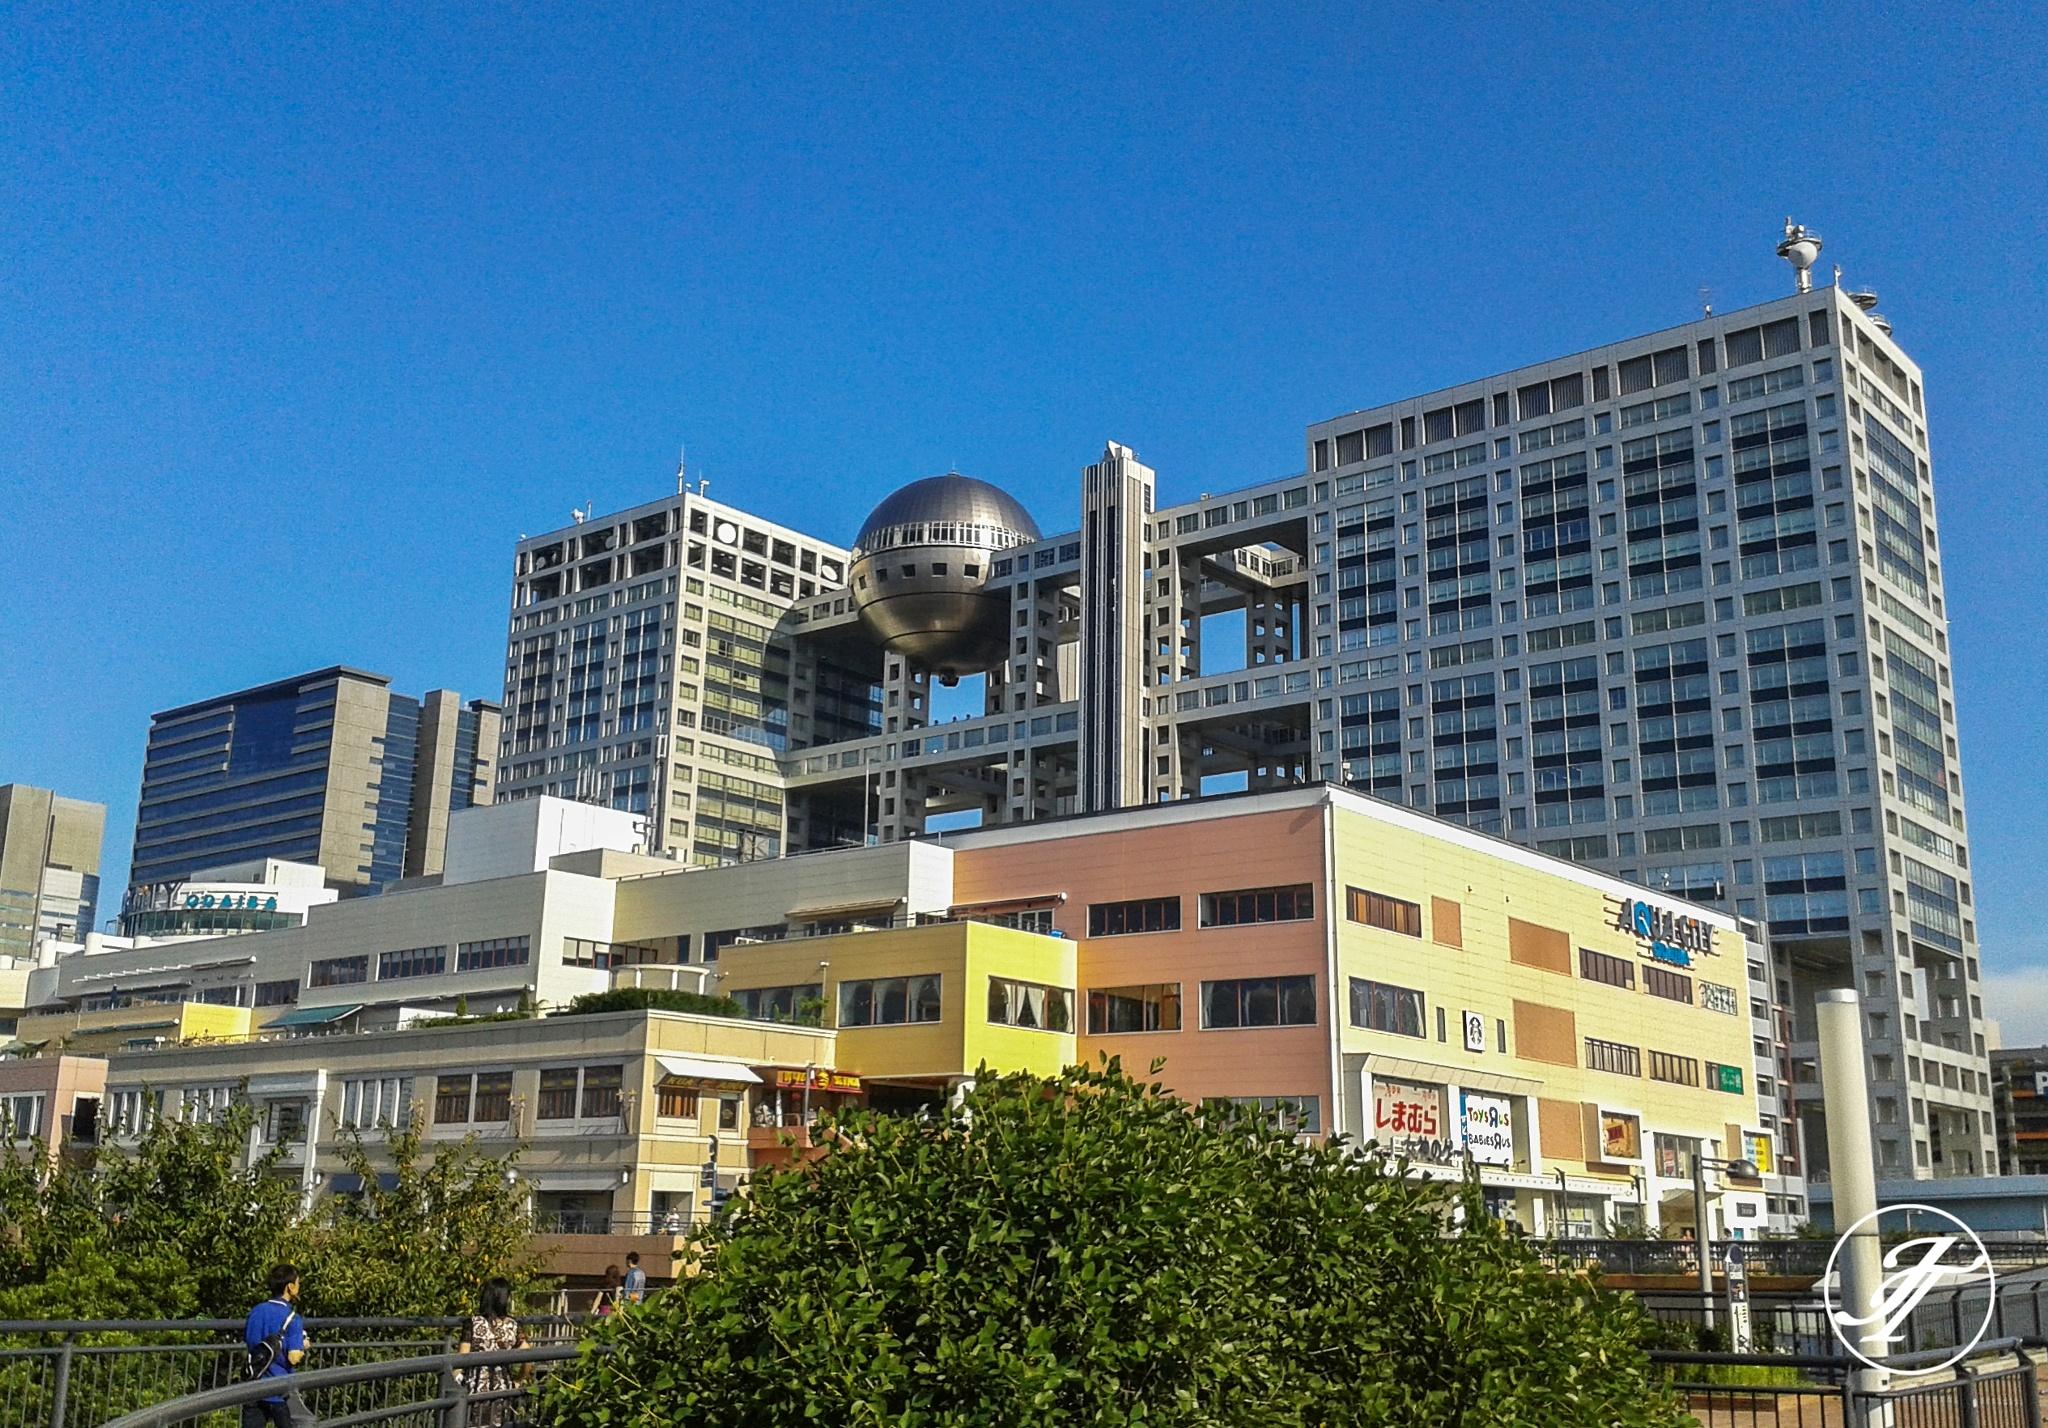 Fuji TV Building by Kenzo Tange by Jasmin